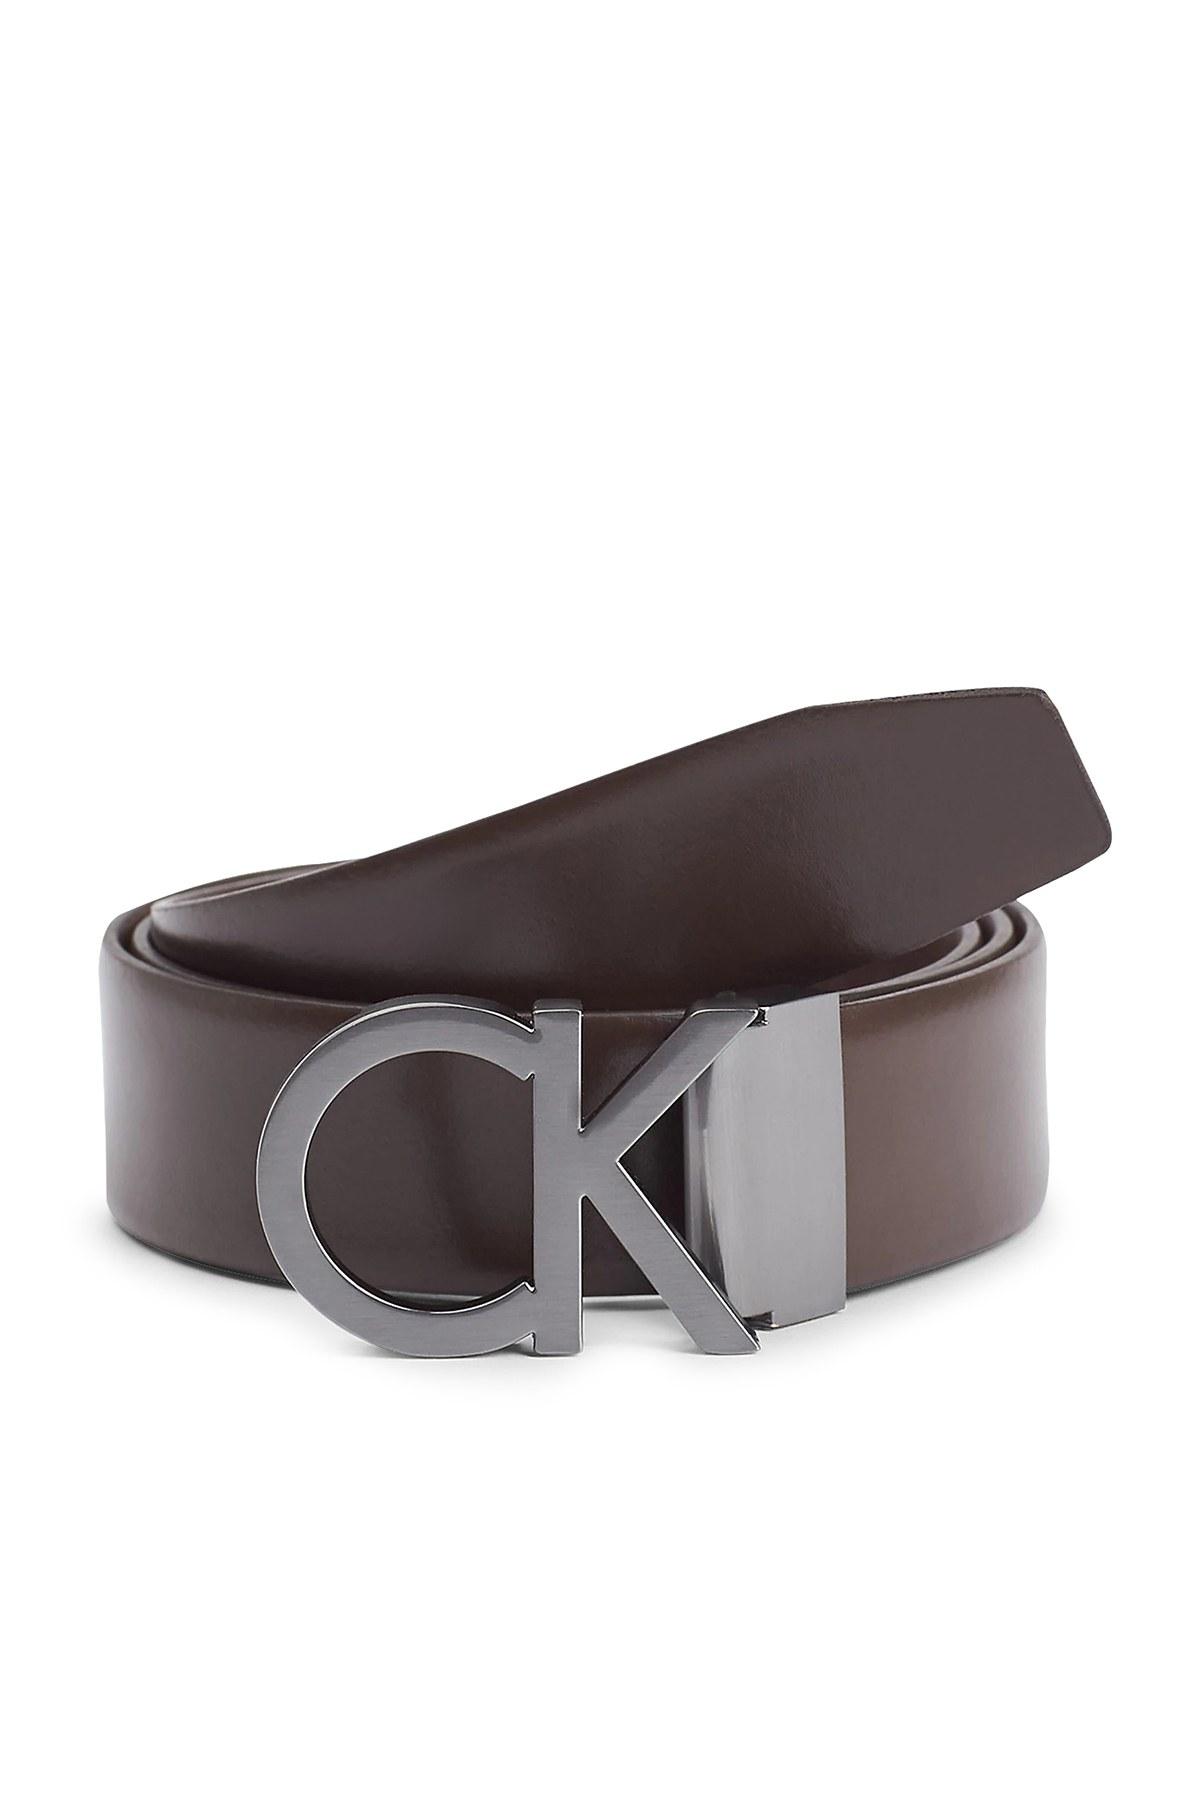 Calvin Klein Hakiki Deri Erkek Kemer Takım K50K506118 0GL SİYAH